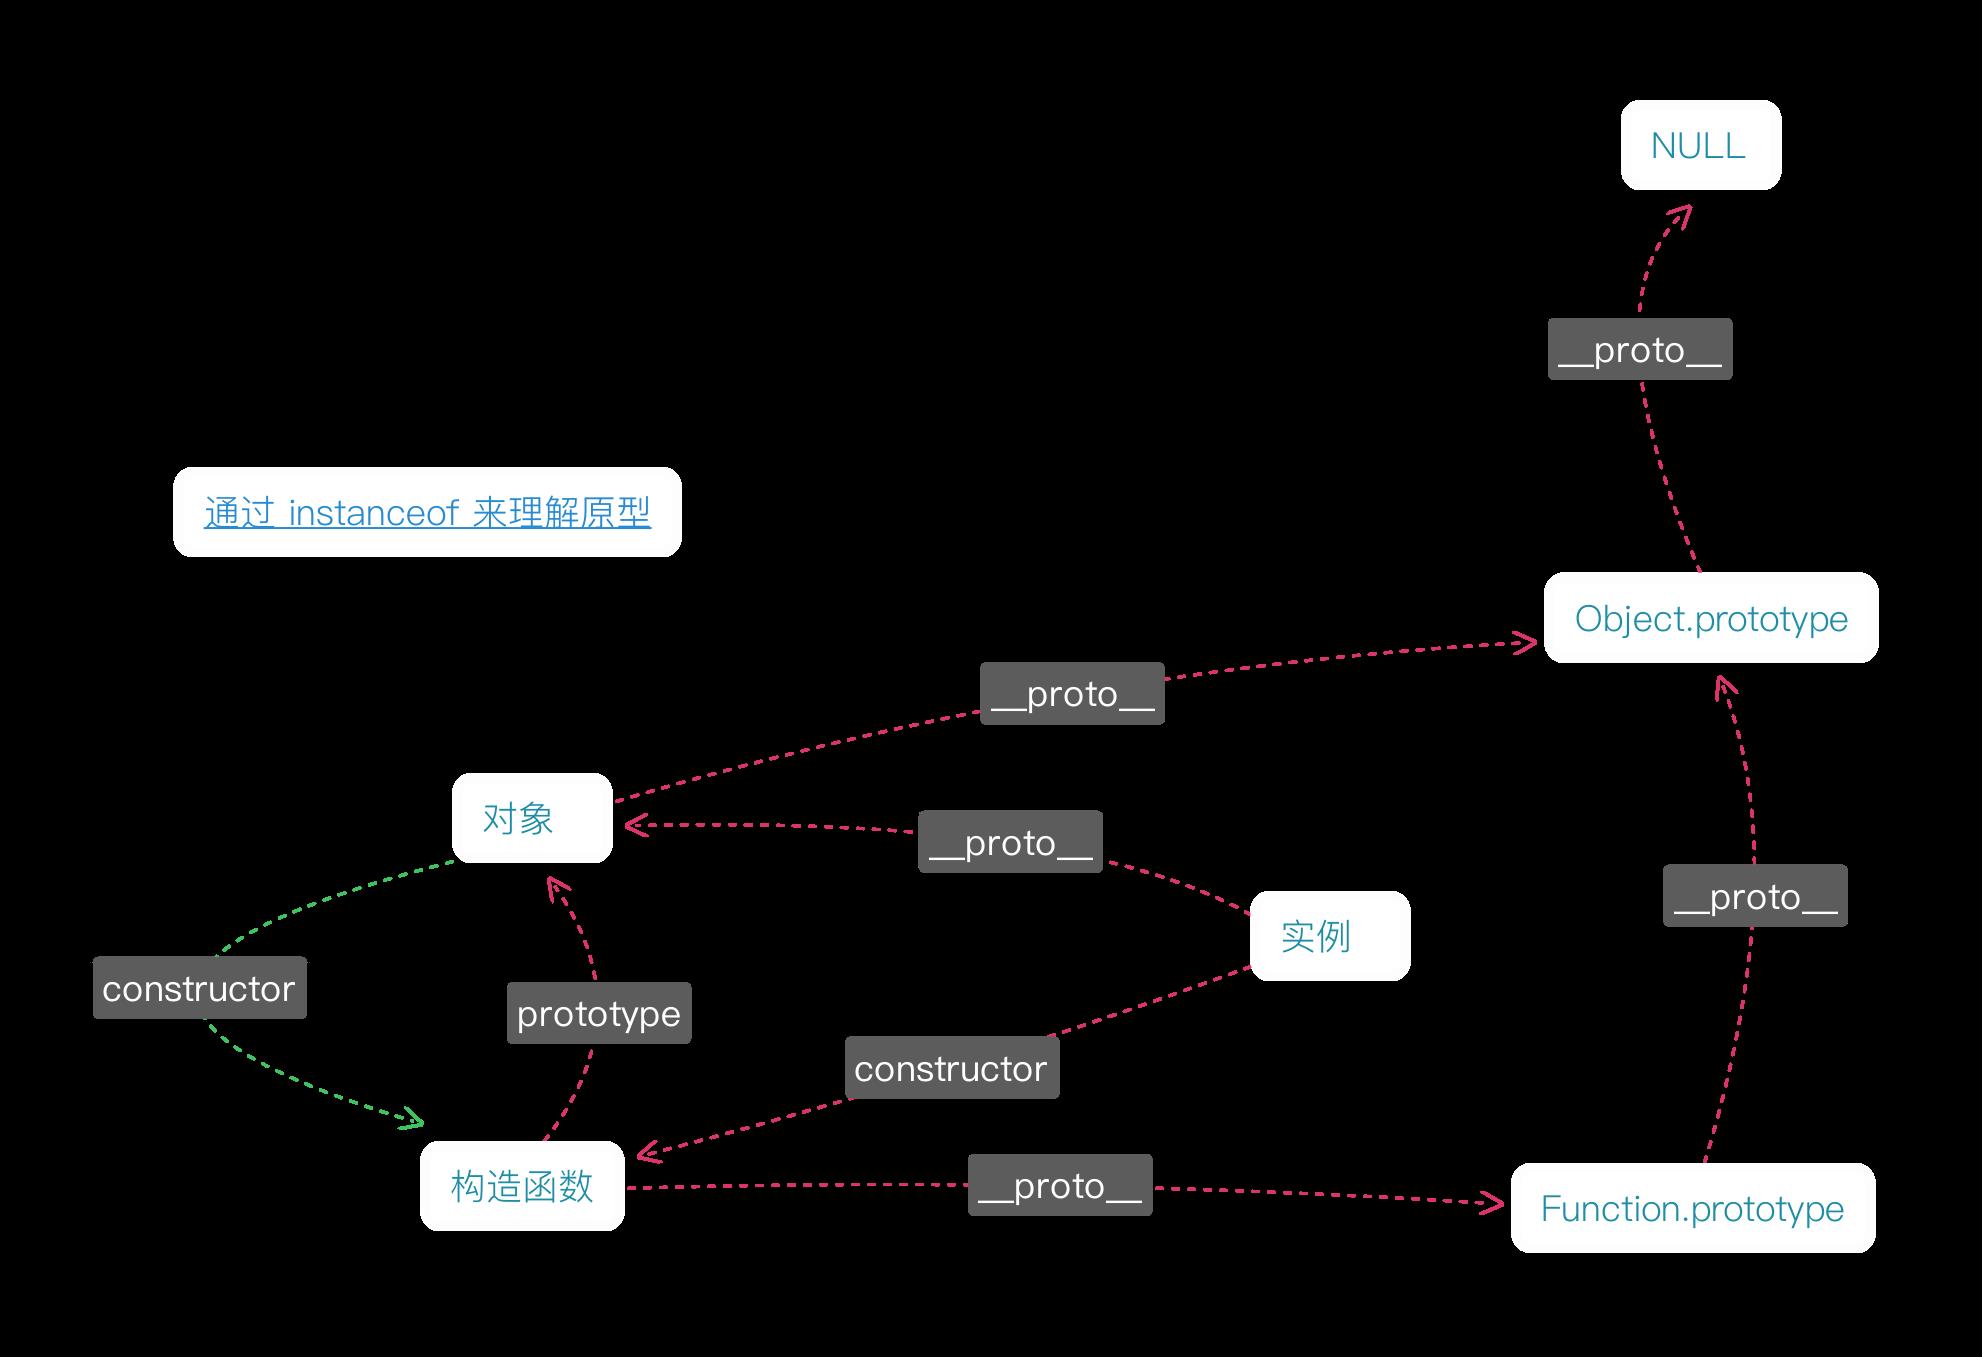 Cover Image for Javascript 中实现对象原型继承的三种方式